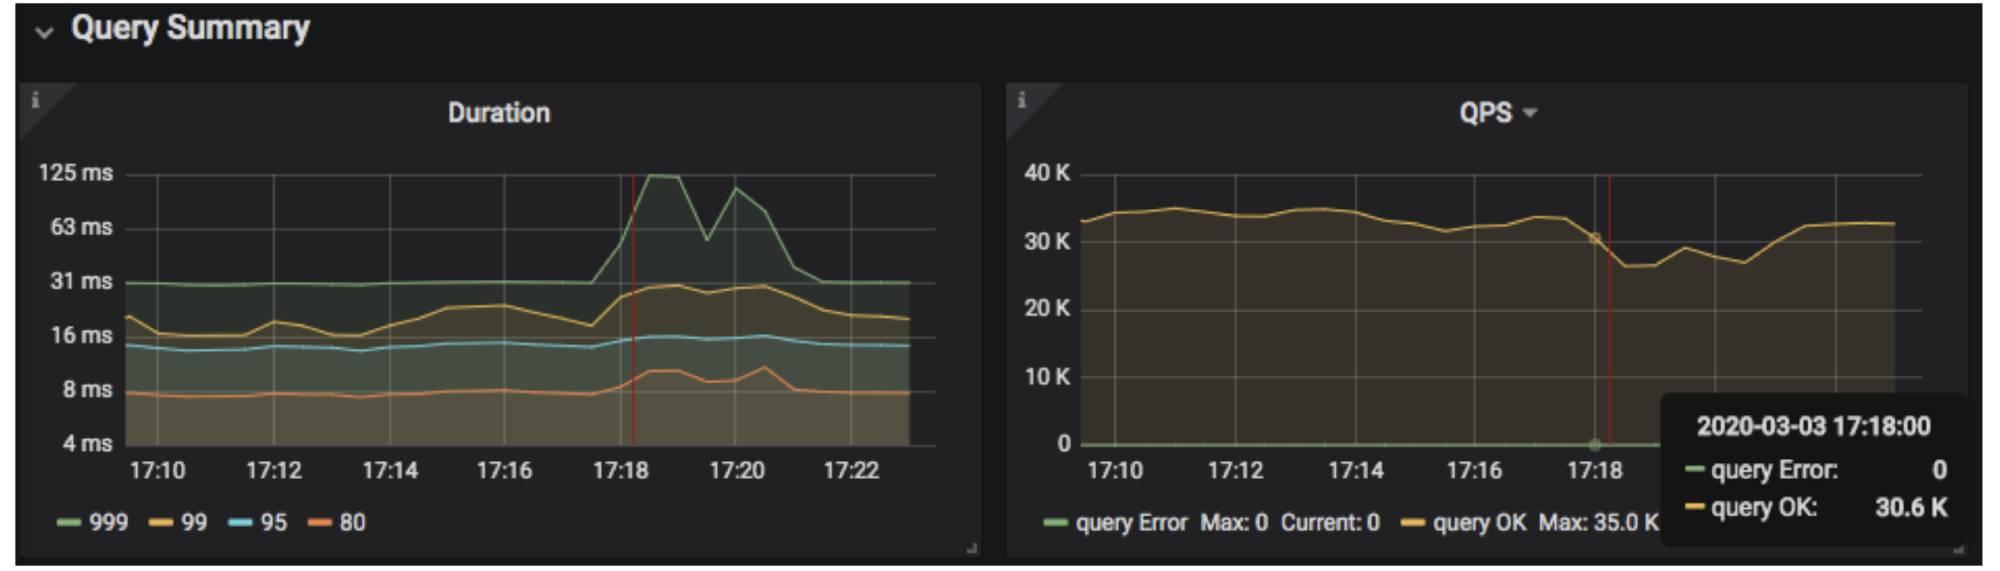 999th percentile latency